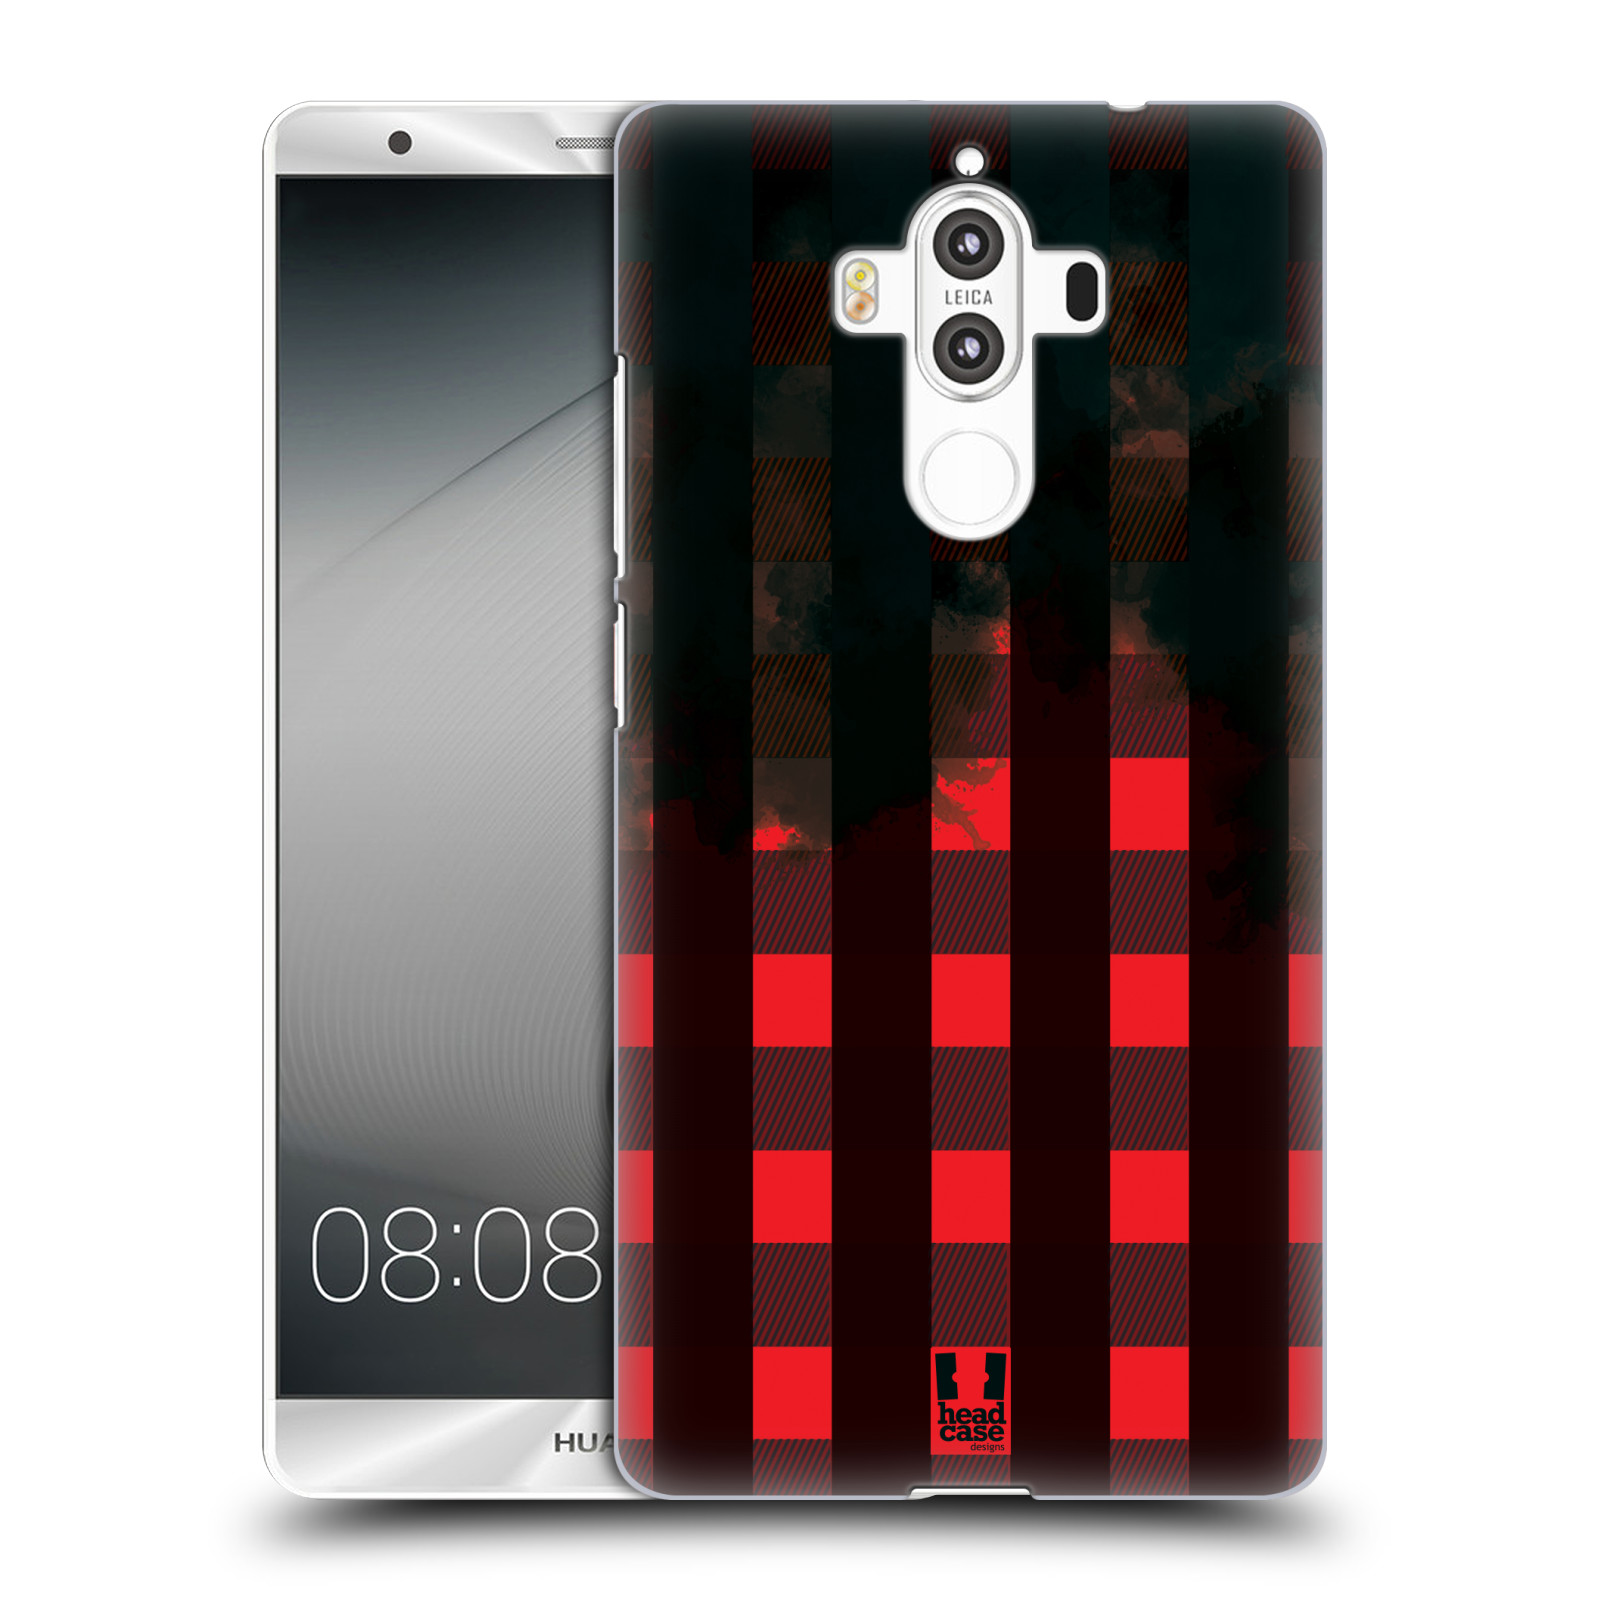 Plastové pouzdro na mobil Huawei Mate 9 - Head Case FLANEL RED BLACK (Plastový kryt či obal na mobilní telefon Huawei Mate 9 (Dual SIM))